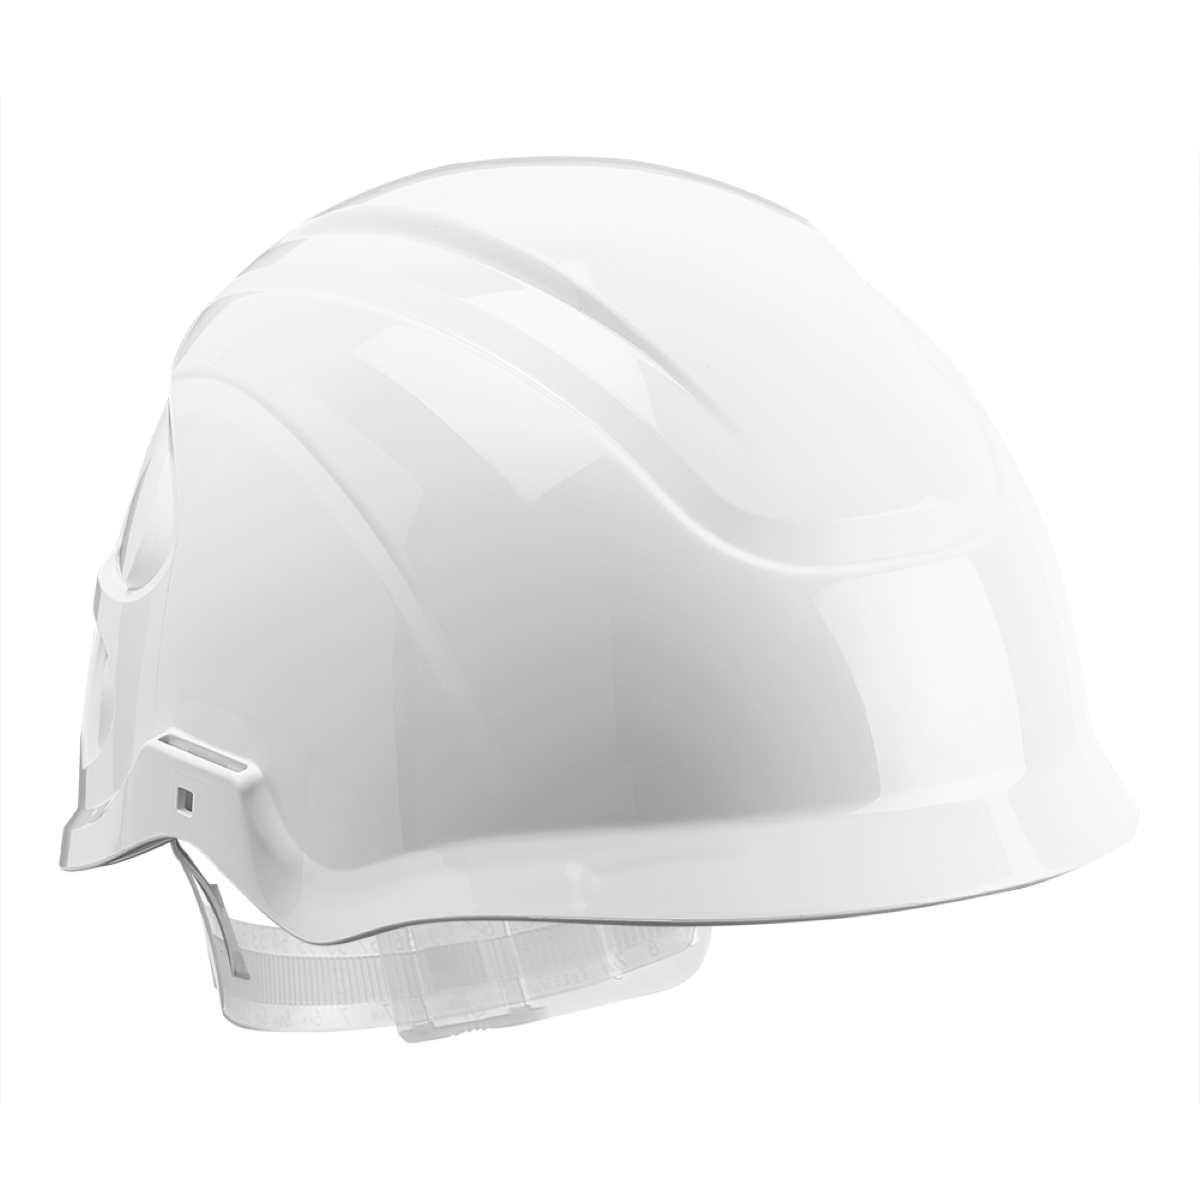 HF0011 Nexus CORE Safety Helmet (vented)